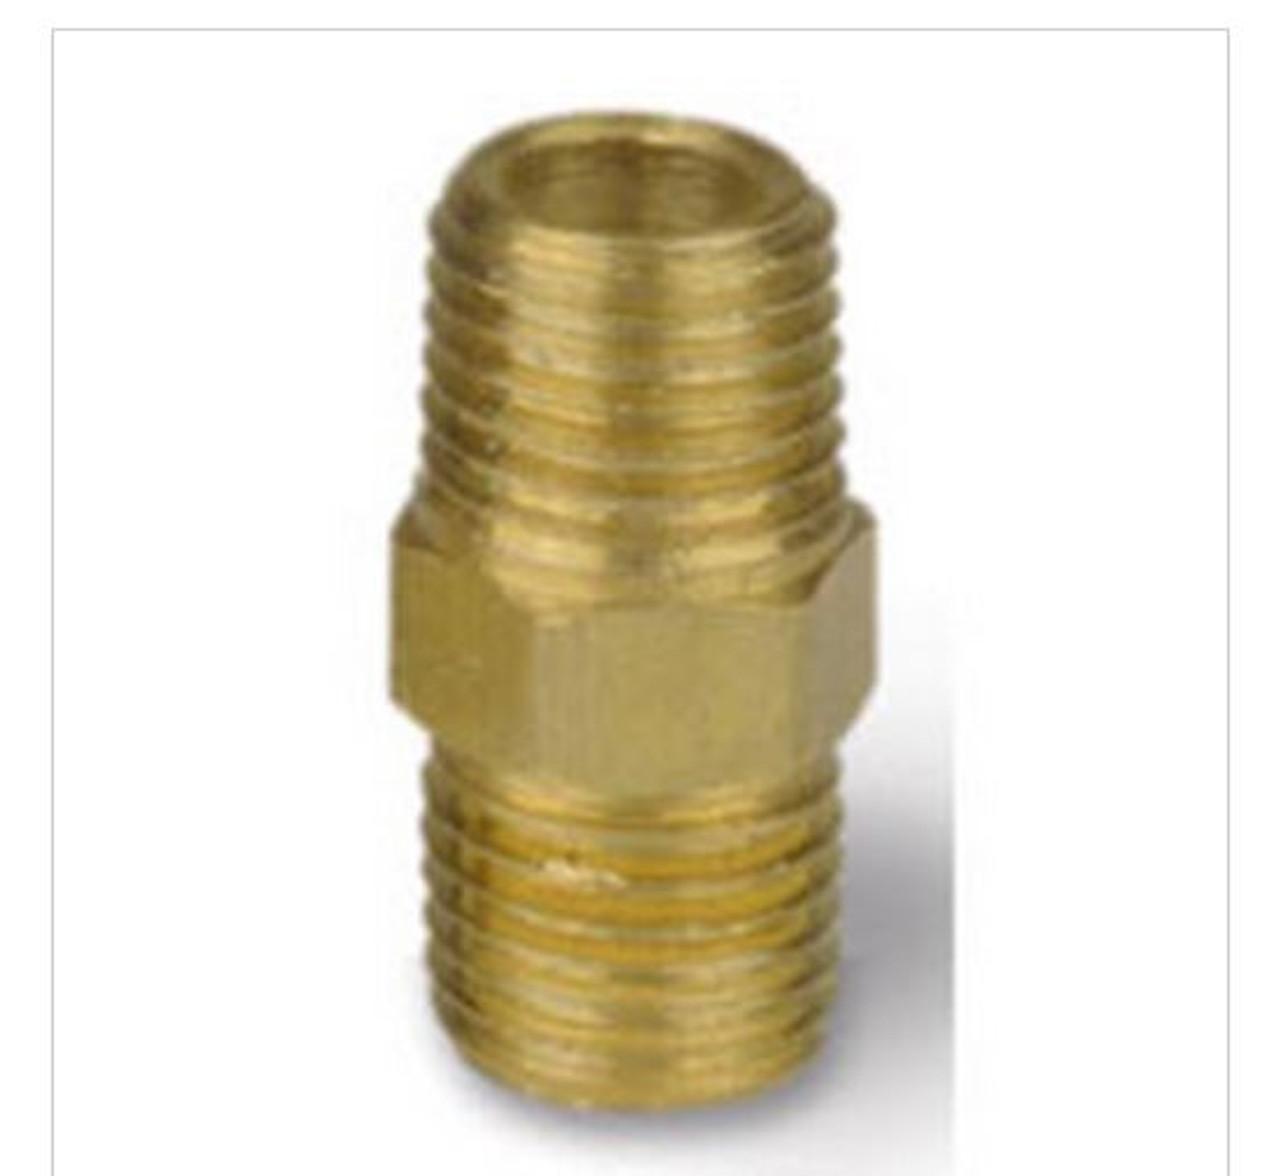 "4HN - ¼"" M x M Hex Nipple for 3-way valve"